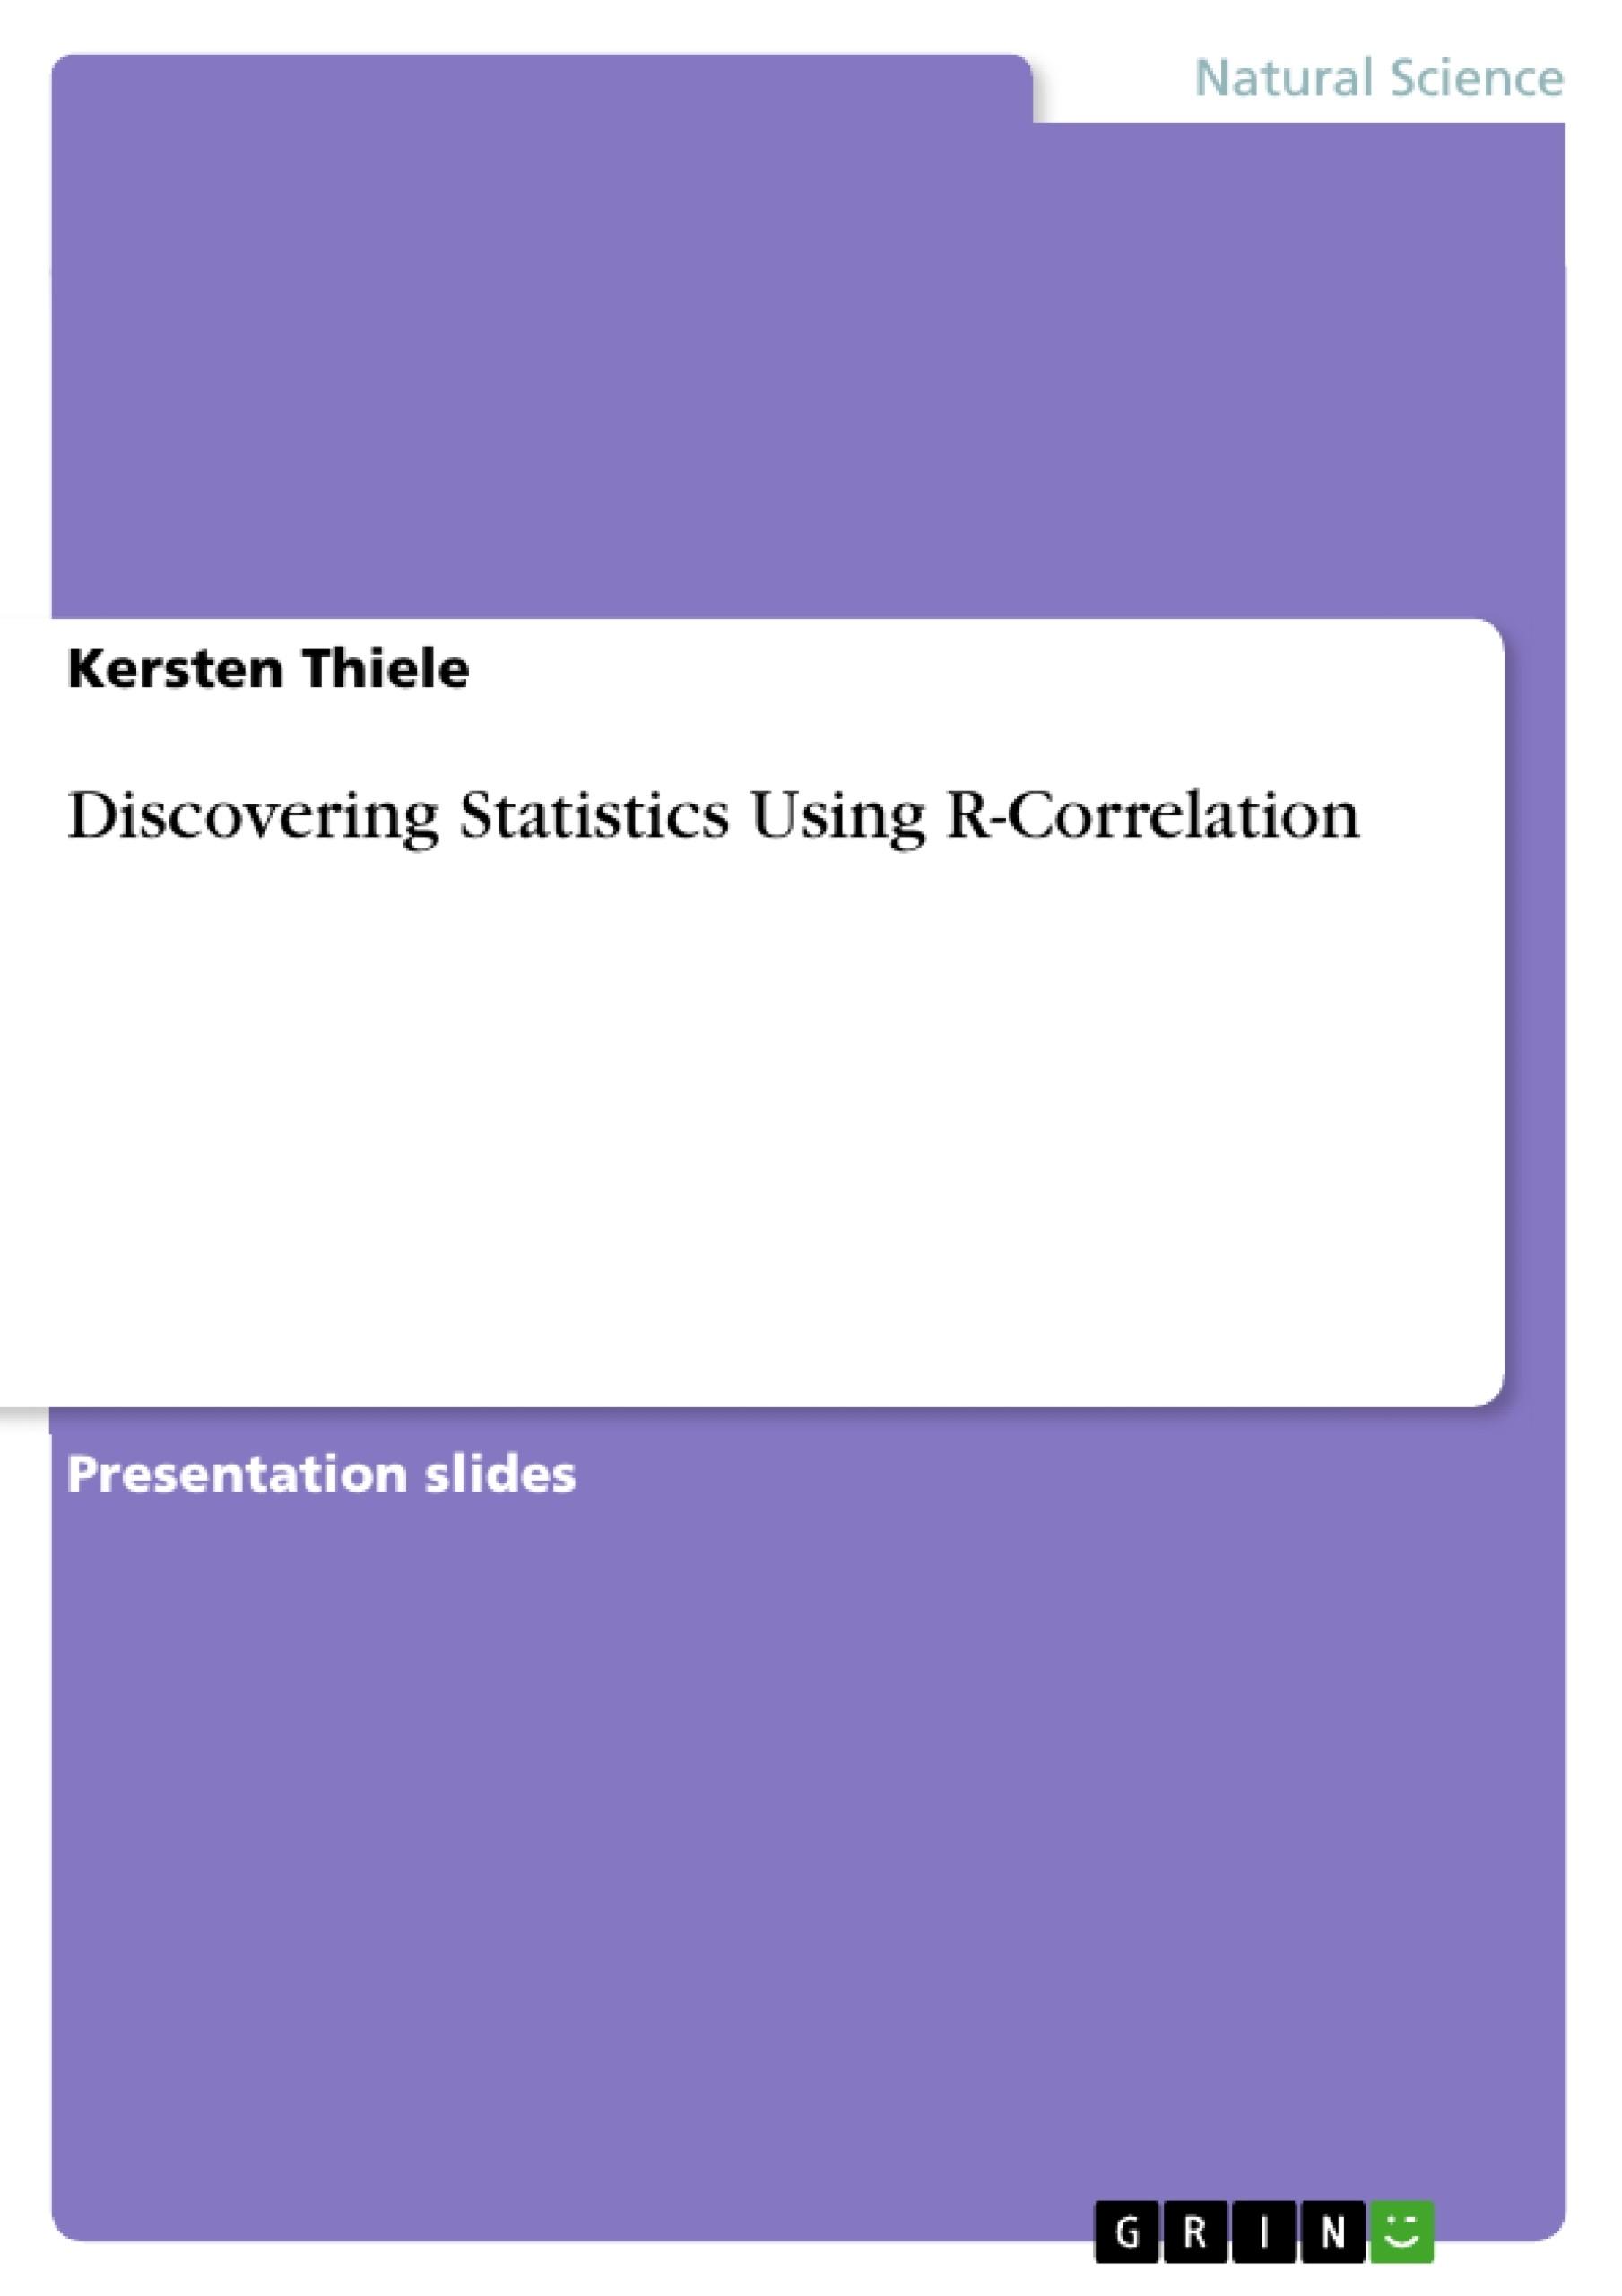 Title: Discovering Statistics Using R-Correlation